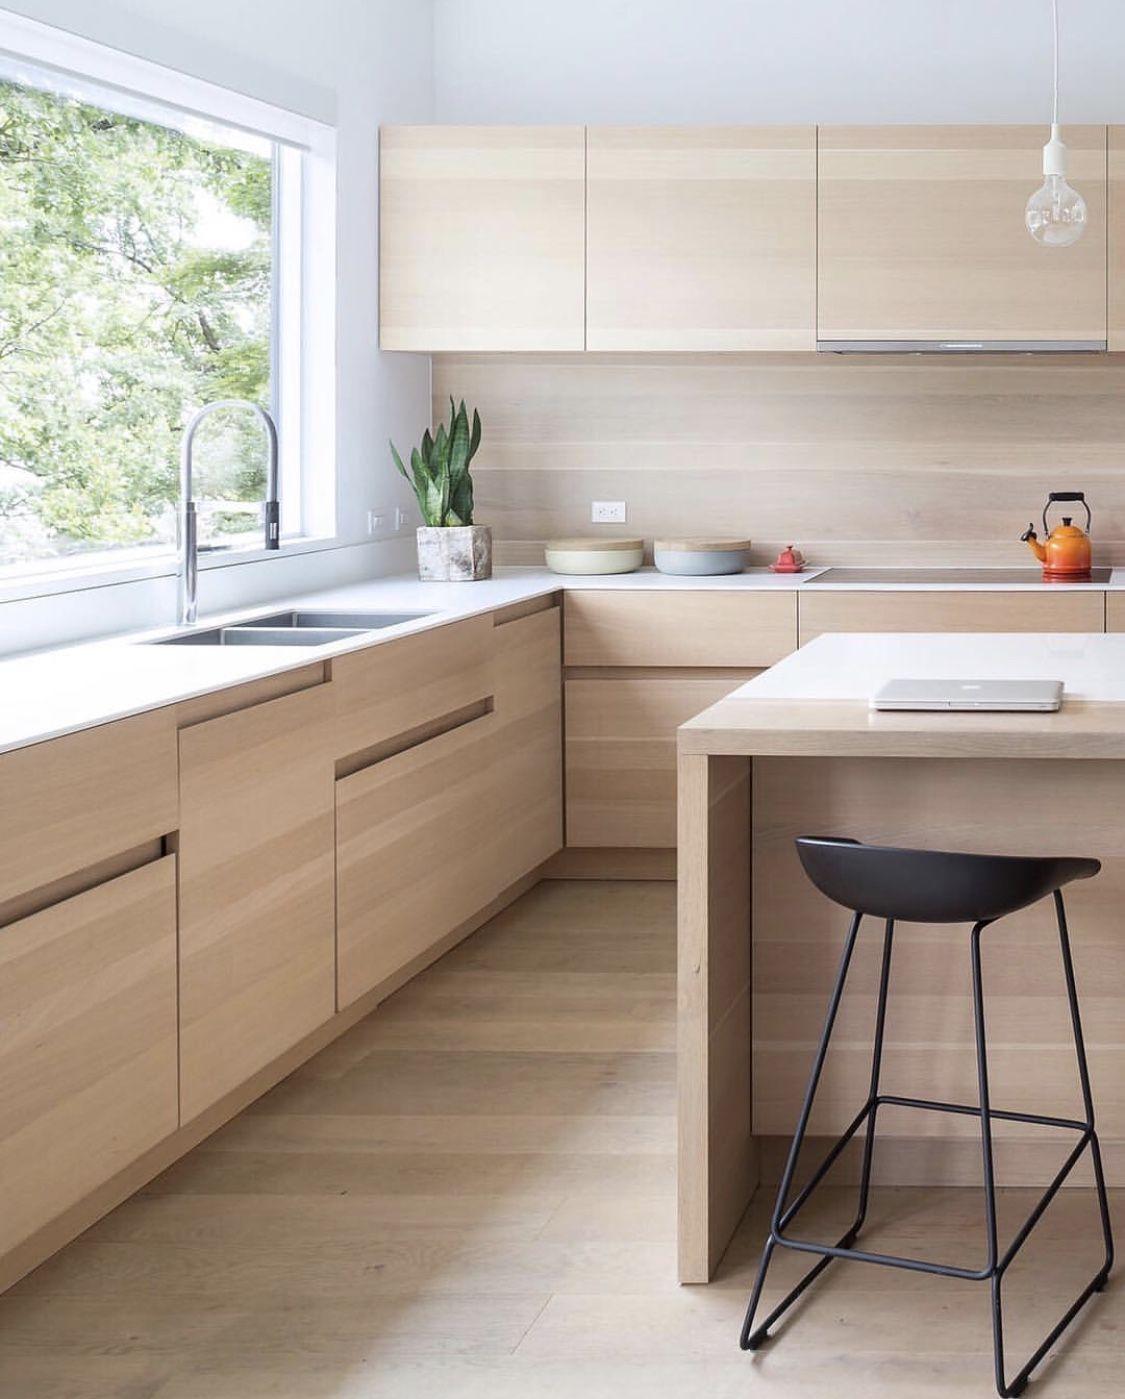 Pin by carlos arnaiz eguren on cocinas pinterest kitchens